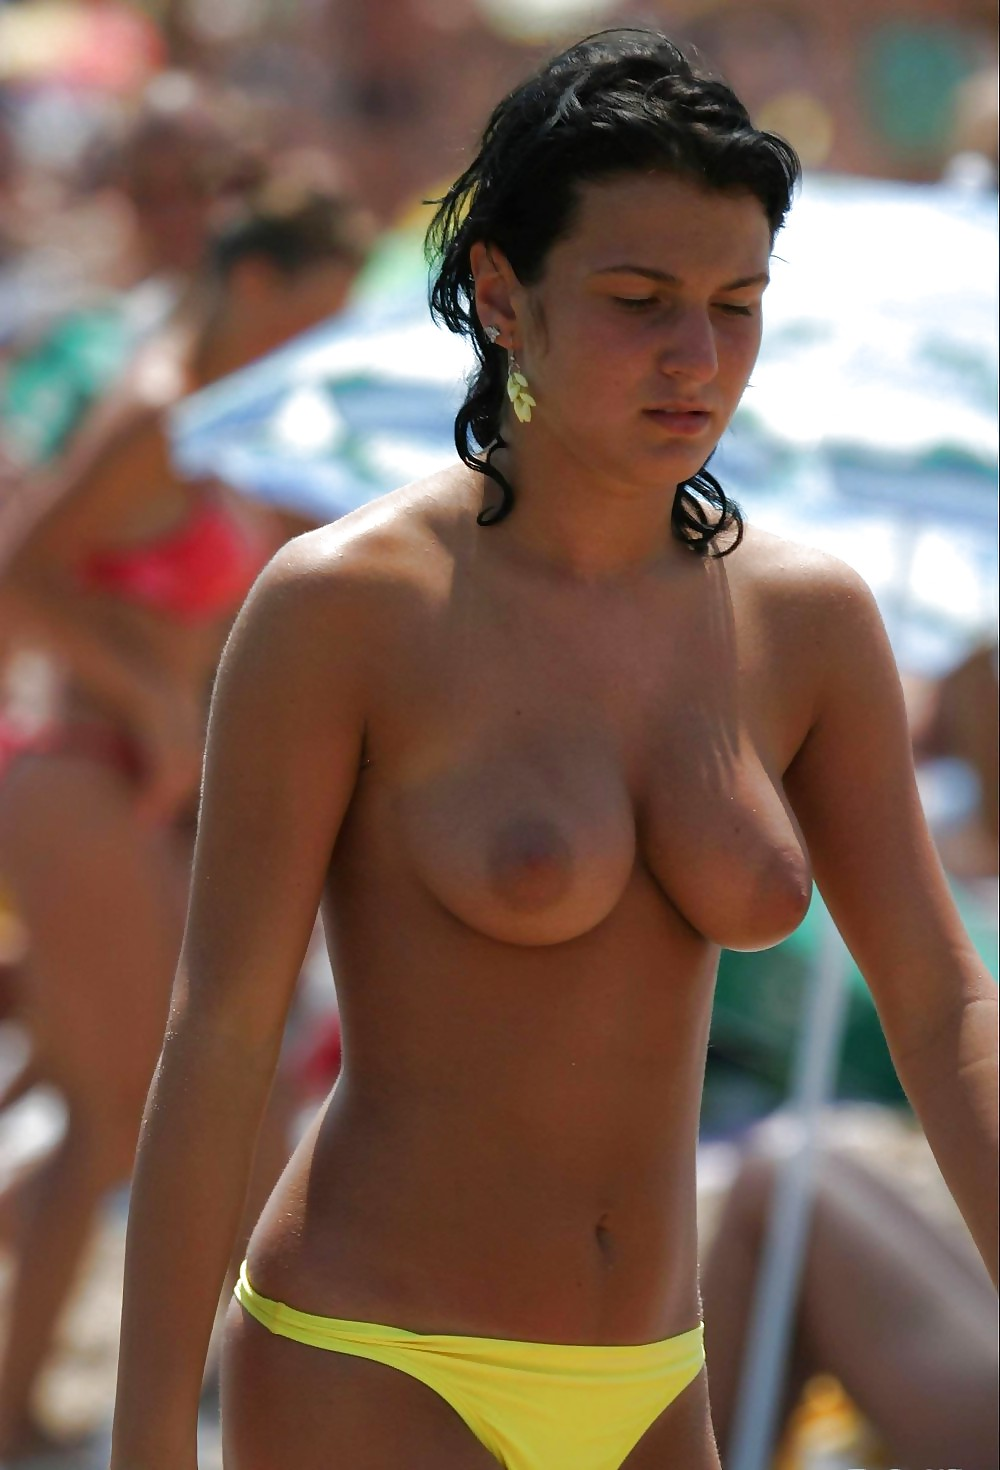 Best tits nude beach-4048